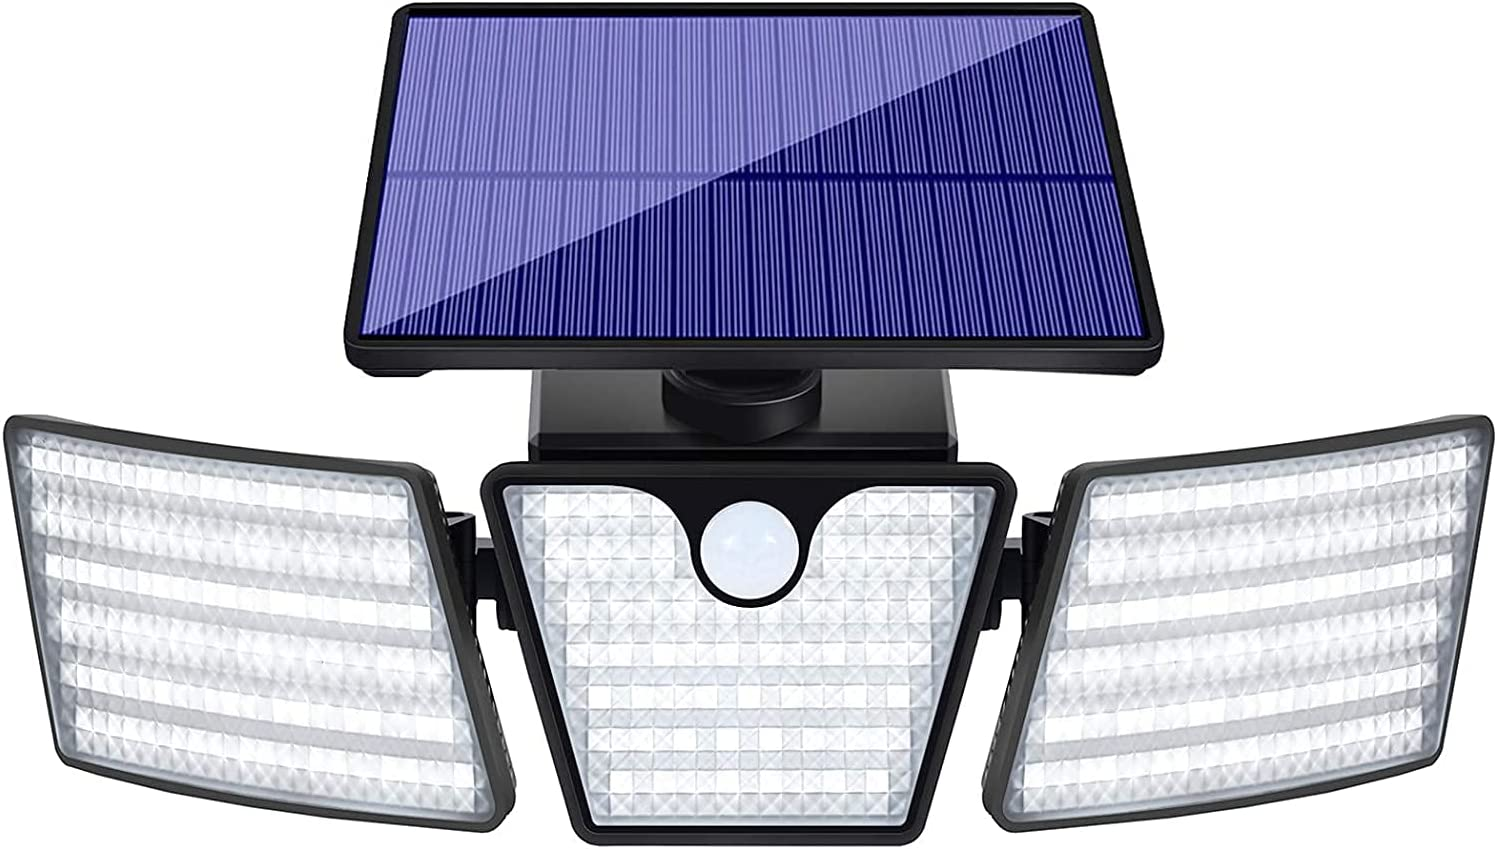 Labensanwa Security Solar Lights Outdoor Motion Sensor, 265 LED 2400LM 6500K Waterproof Outdoor Spotlights, 3 Head 360° Adjustable Flood Lights for Wall Porch Garden Patio Yard Garage Pathway